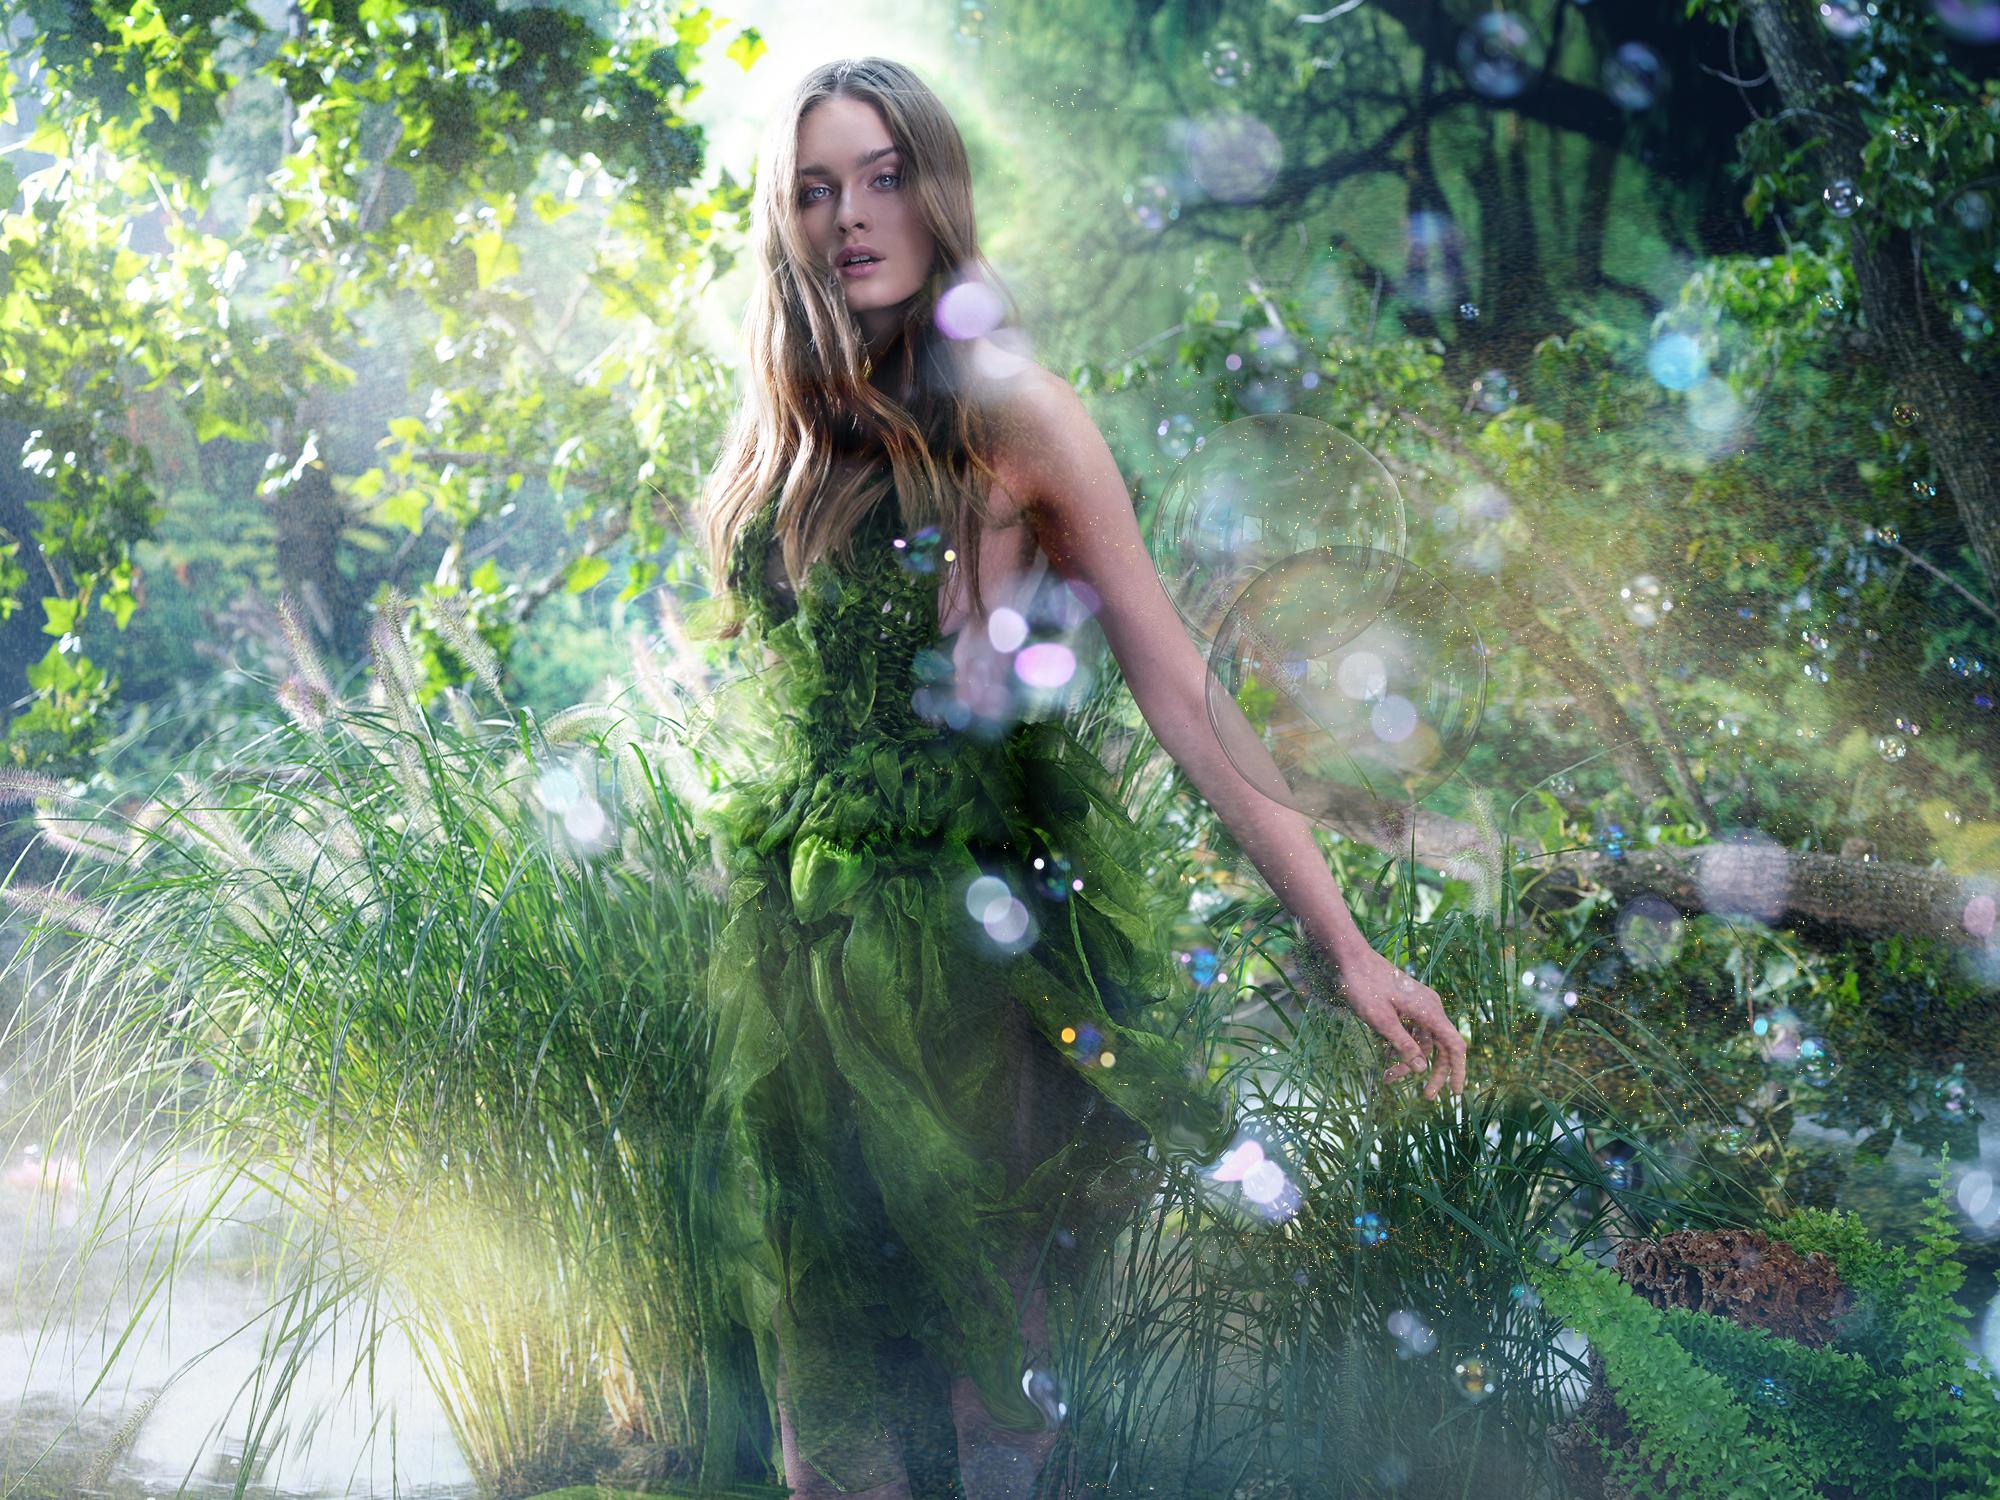 enchanted look 1.1 copy.jpg